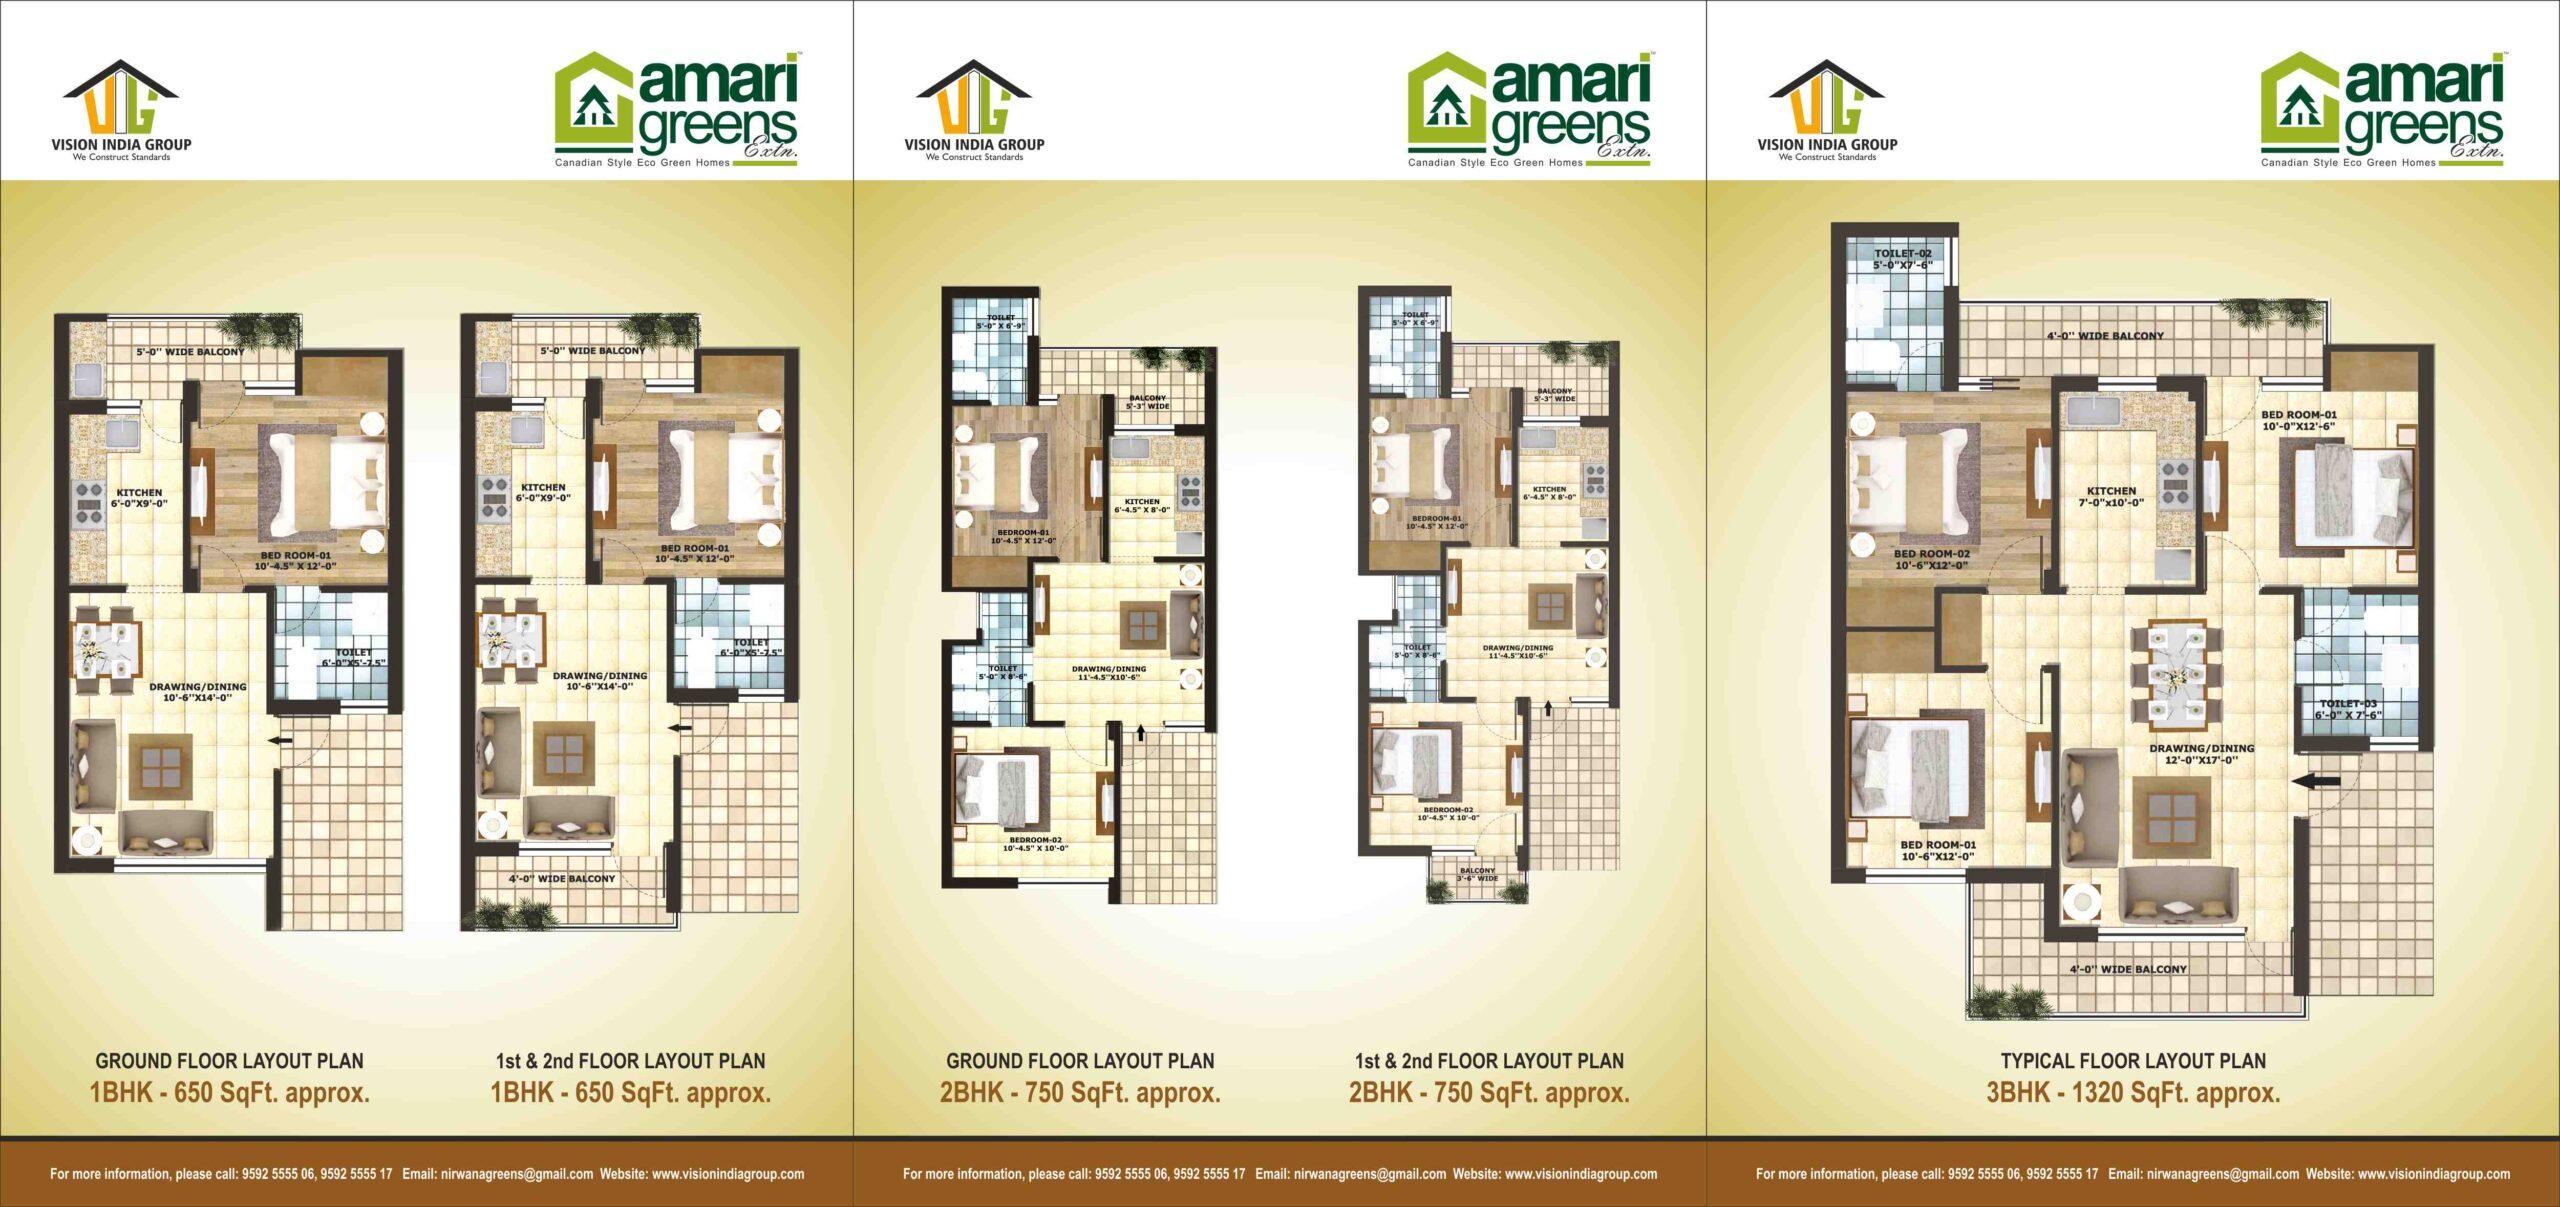 Amari-Extn-Brochure-Inner-1